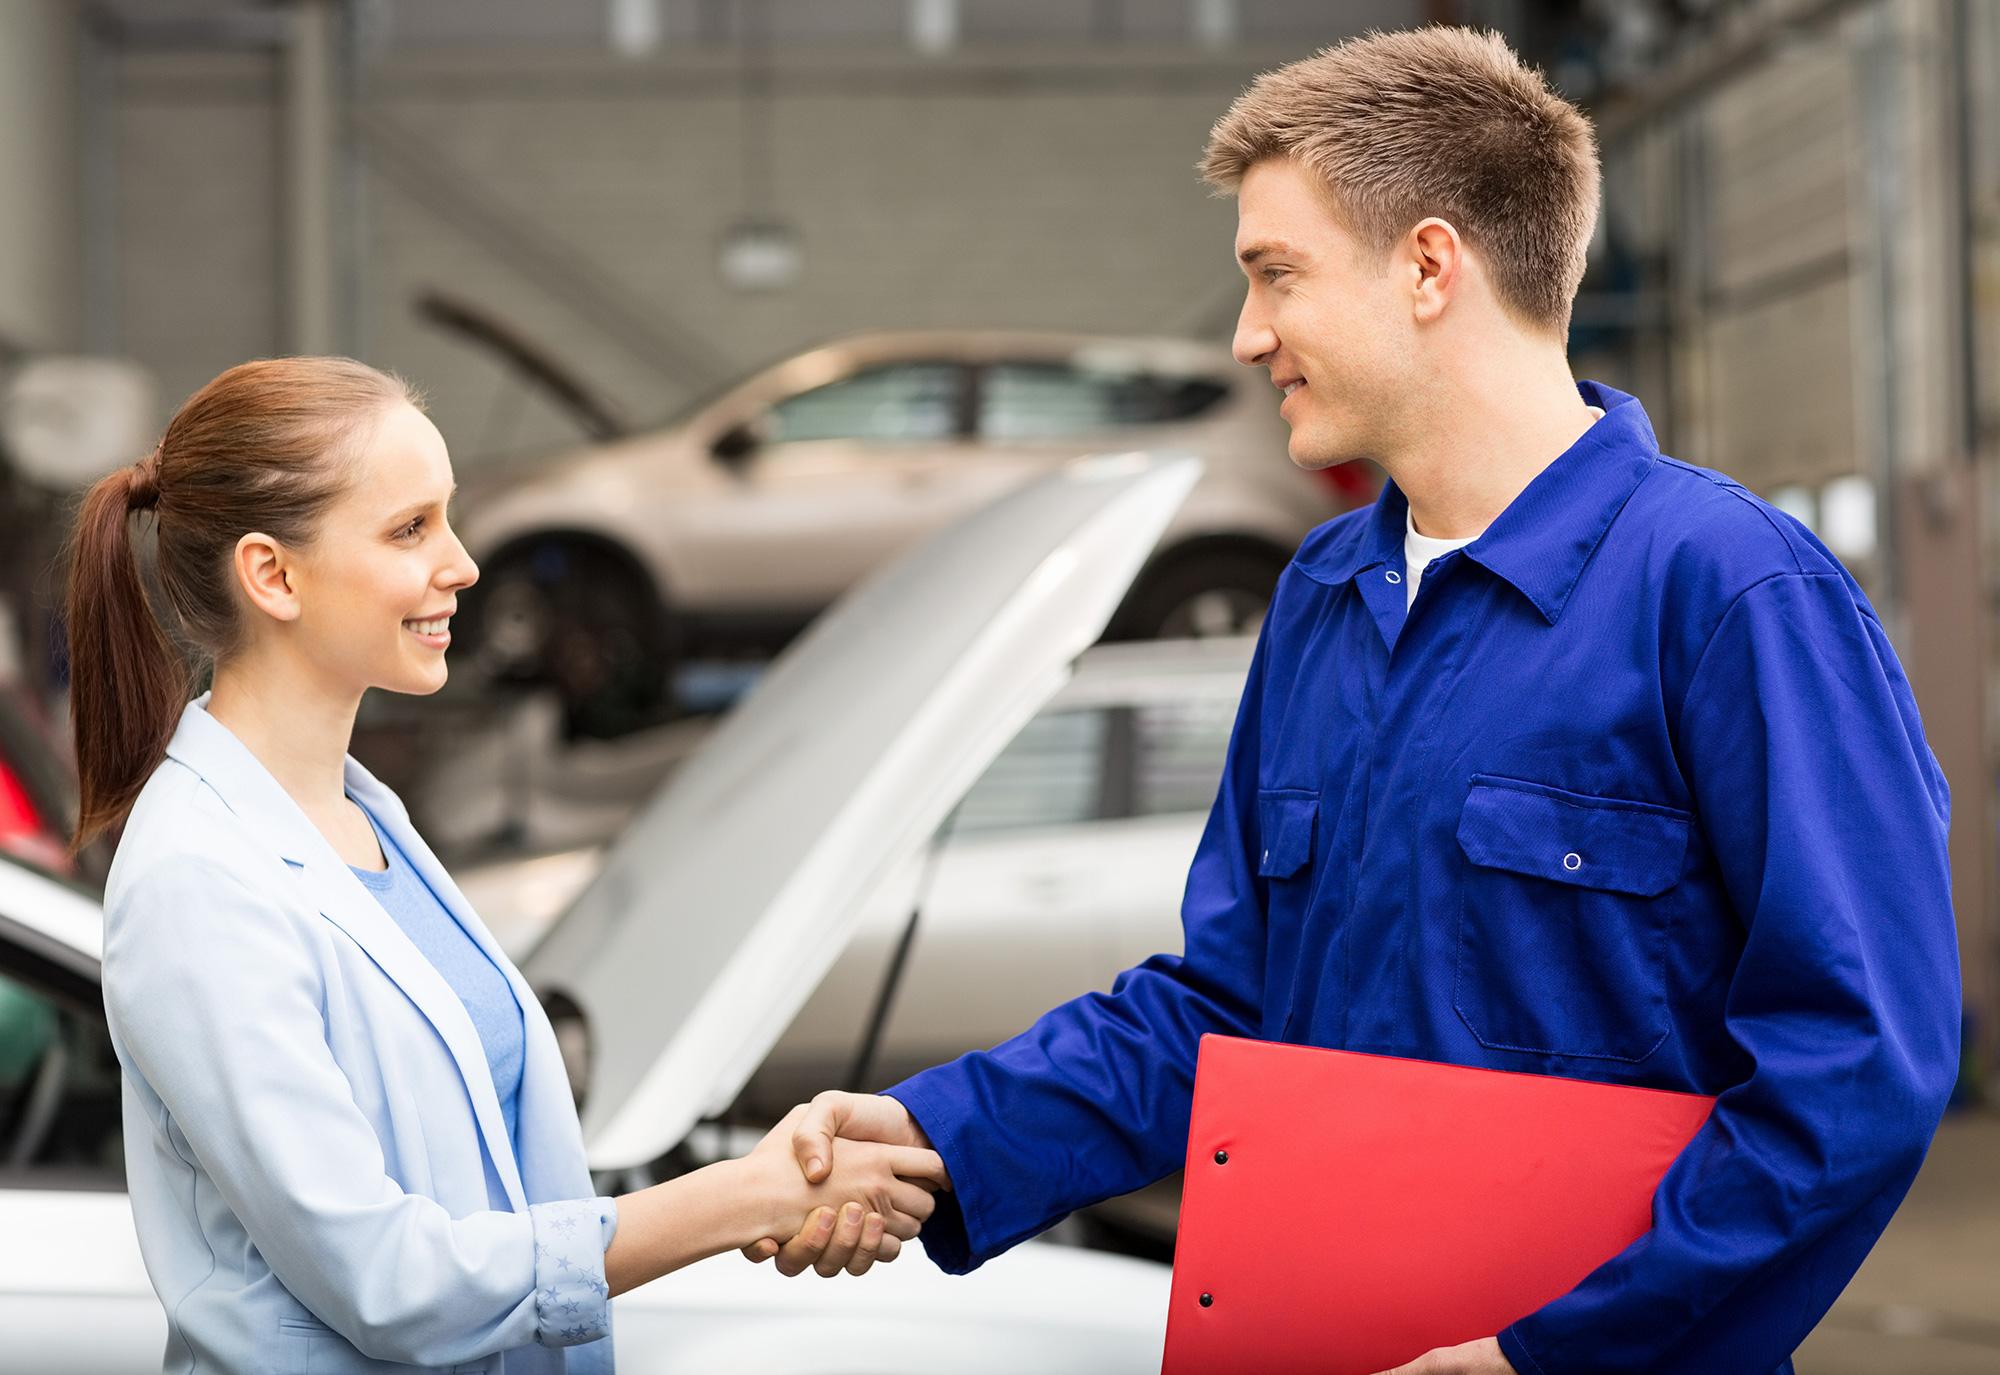 Female-Shaking-Hands-With-Car-Mechanic-000020368761_XXXLarge.jpg